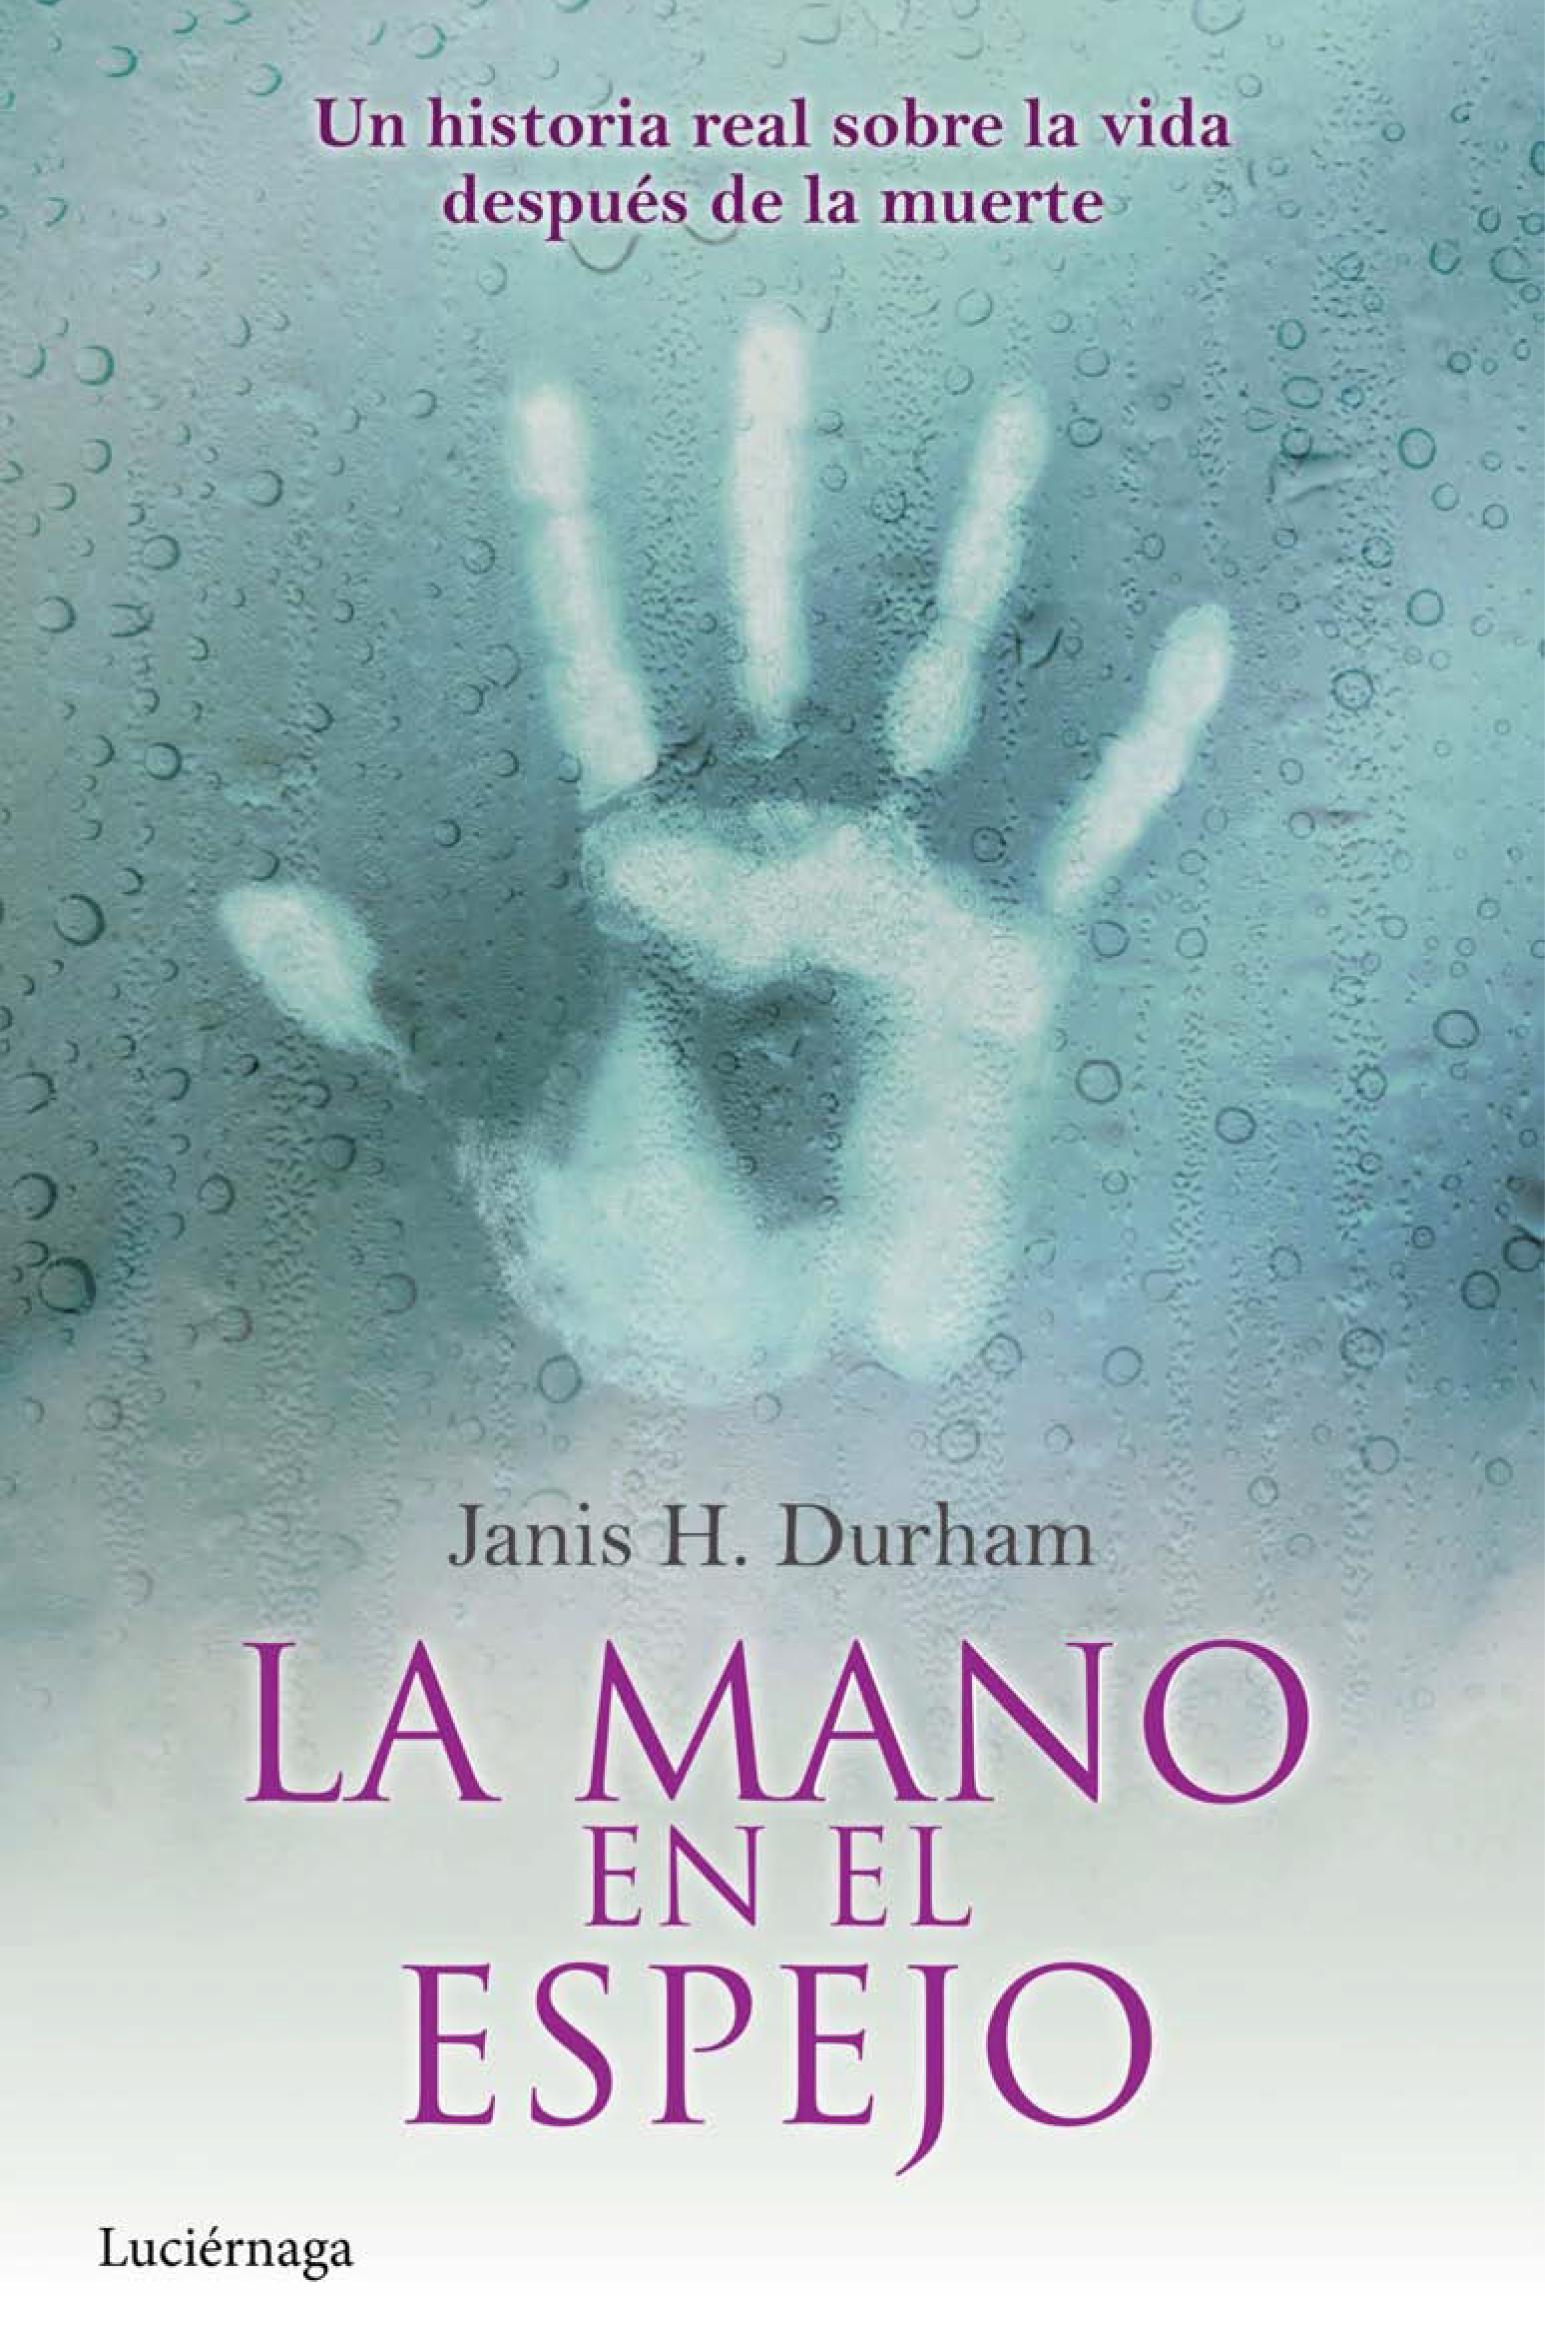 Avance Otoño: 'La mano en el espejo' de Janis Durham